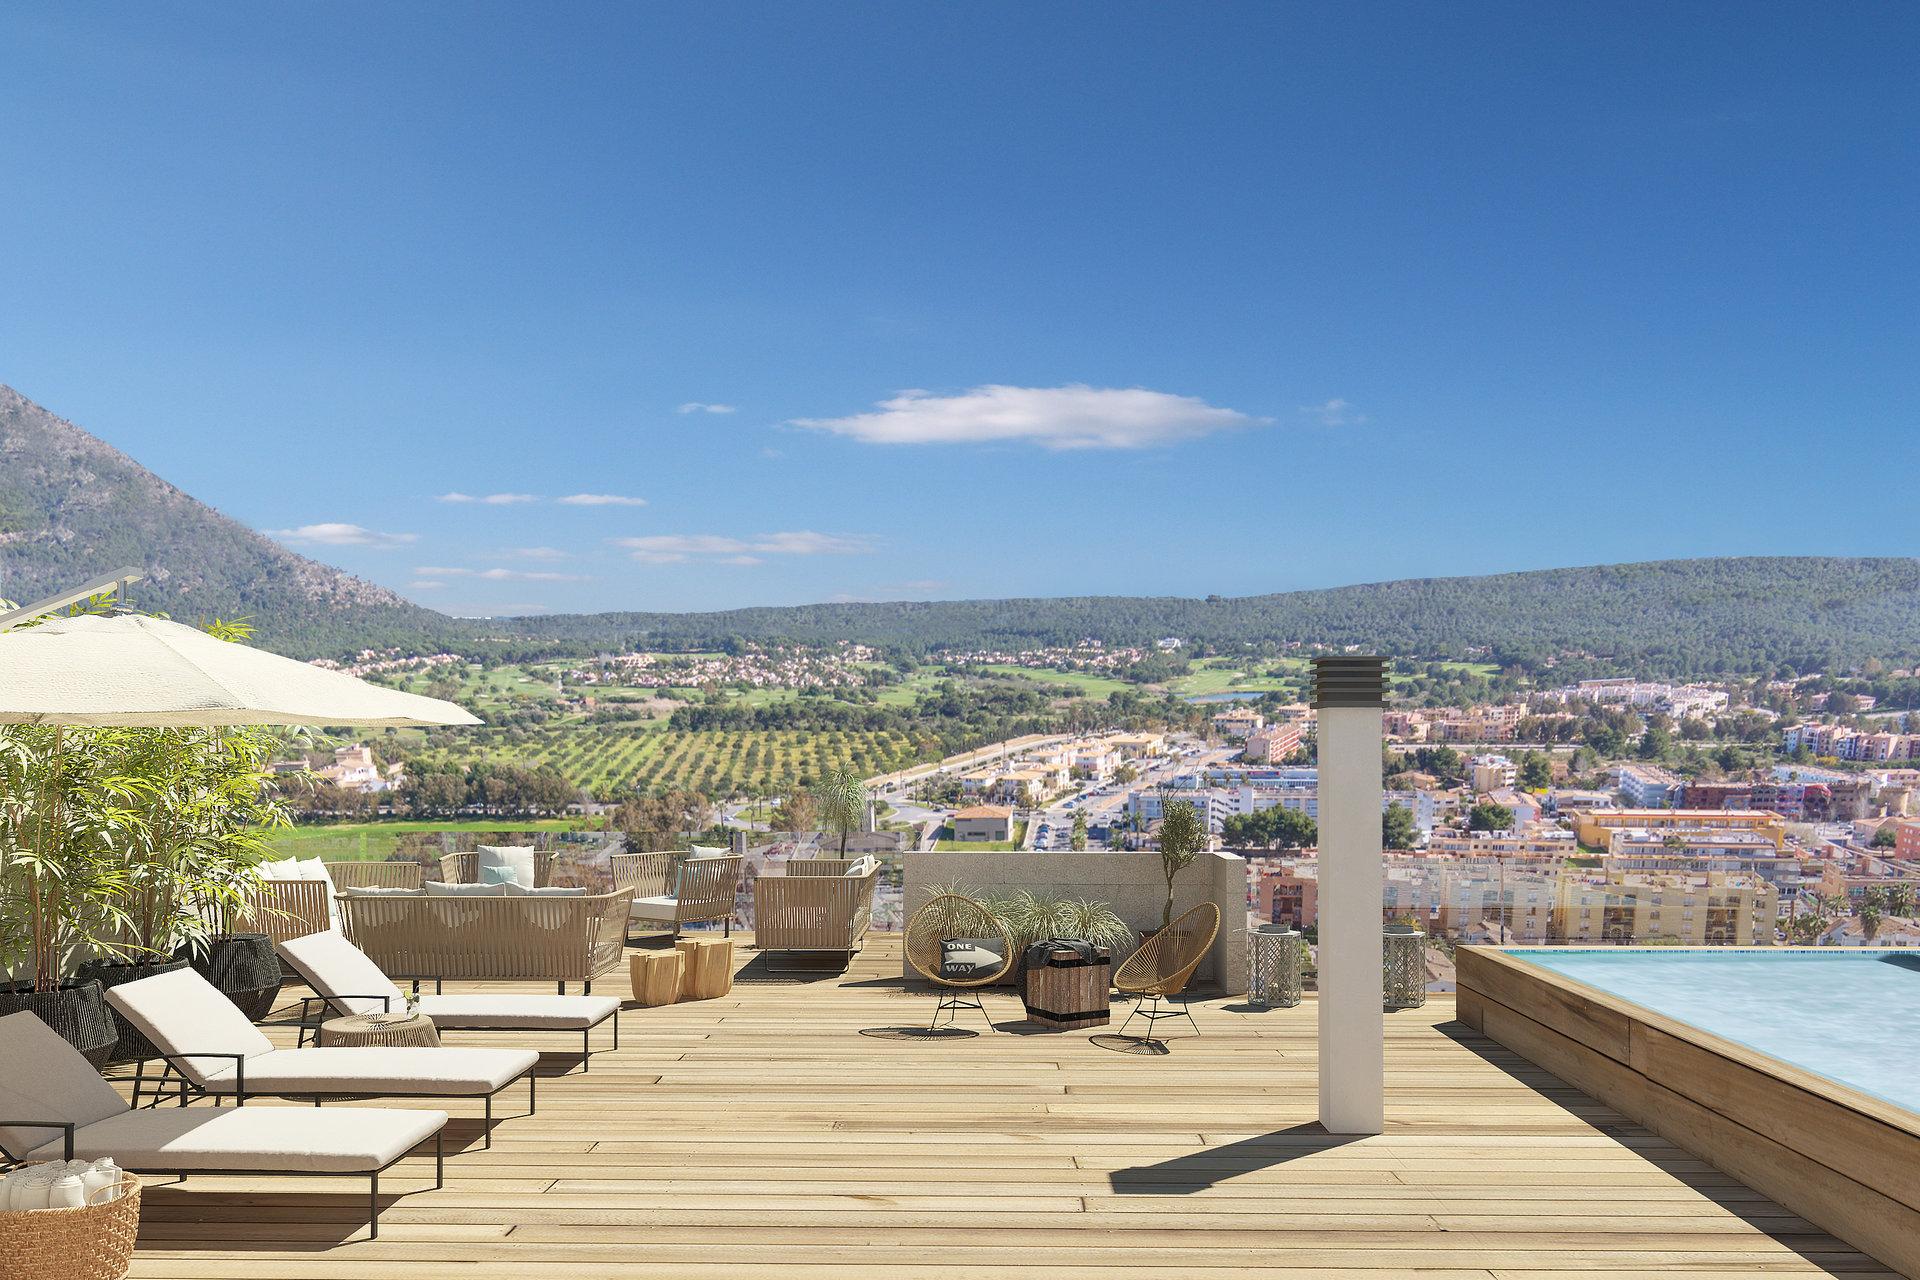 Ad Sale Apartment Santa Ponsa (07180) ref:V0547SP